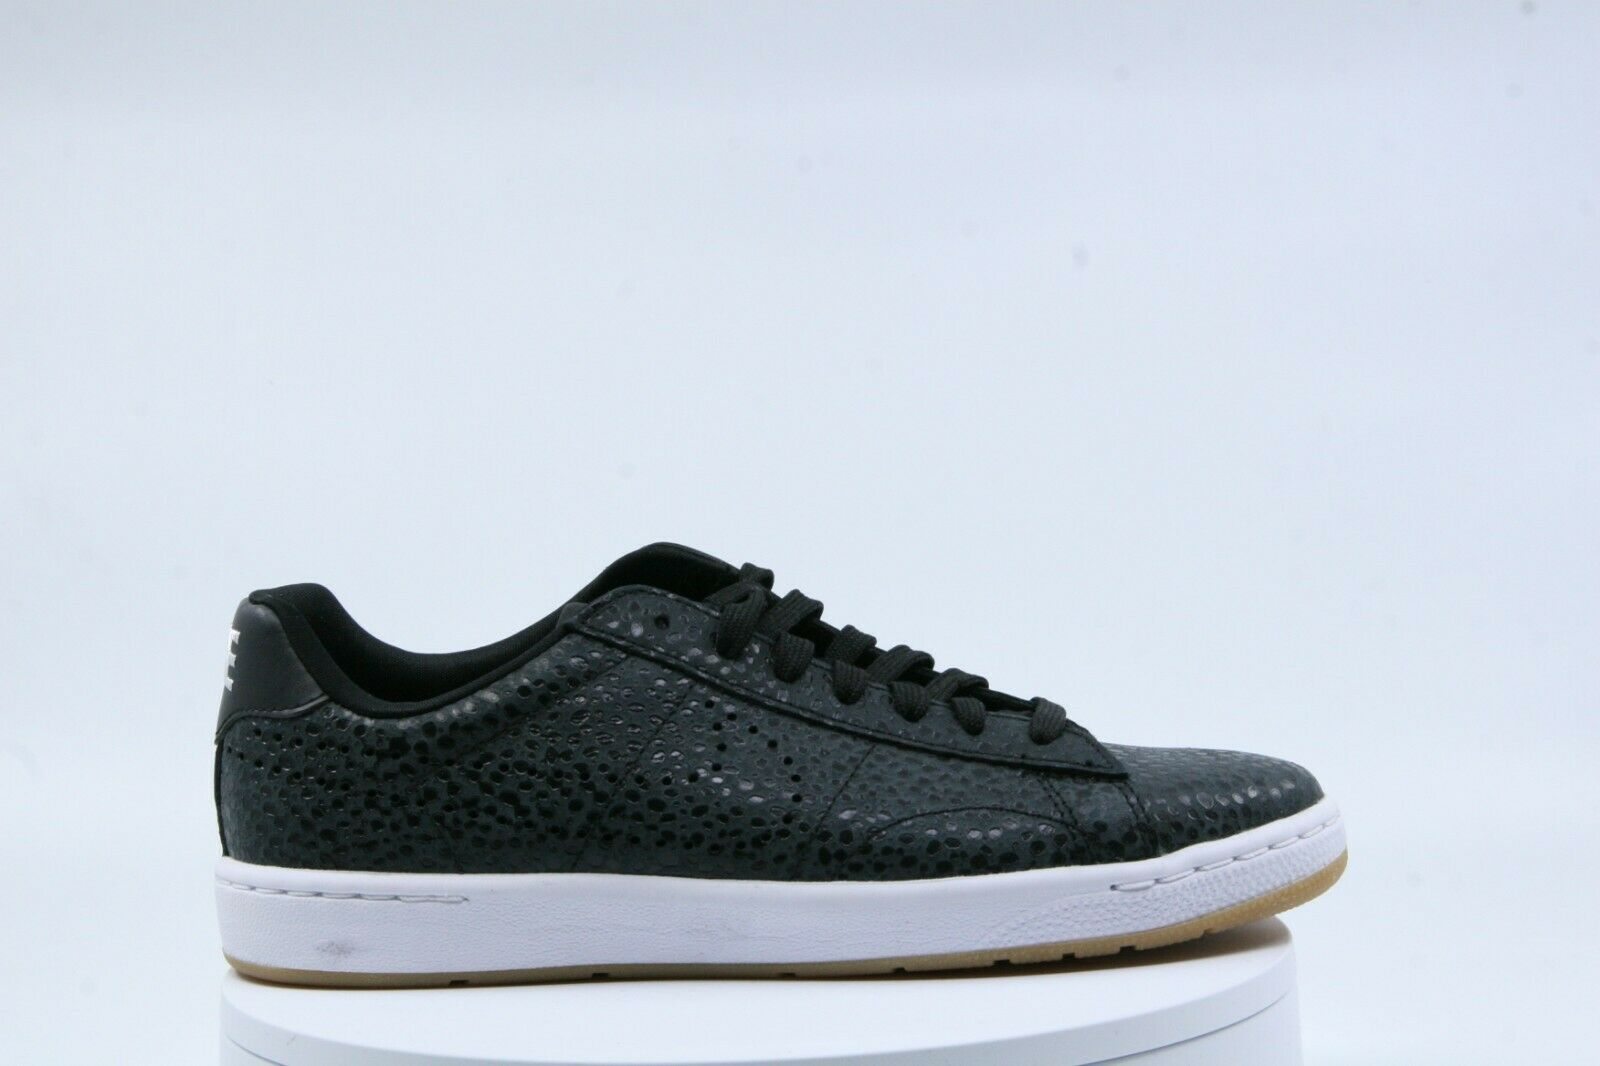 NIKE NIKE NIKE WOMEN'S TENNIS CLASSIC ULTRA PRM Black Leather 7.5W 749647-002 ecf914